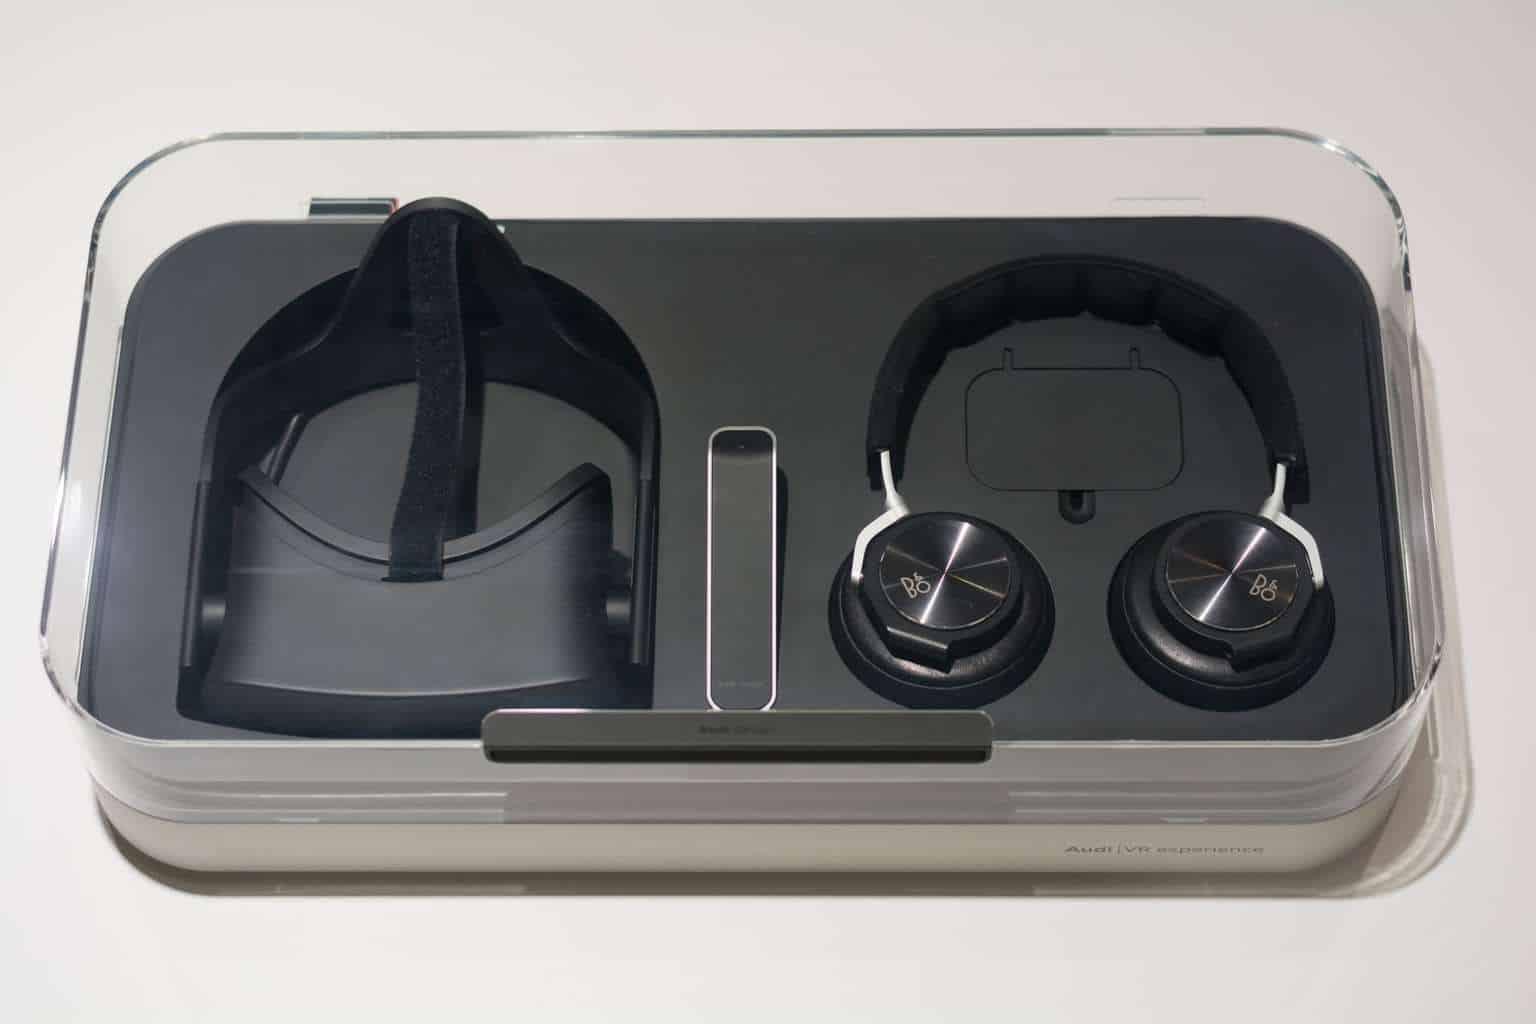 Audi+VR+experience+standard+setup+-+Base+station+2